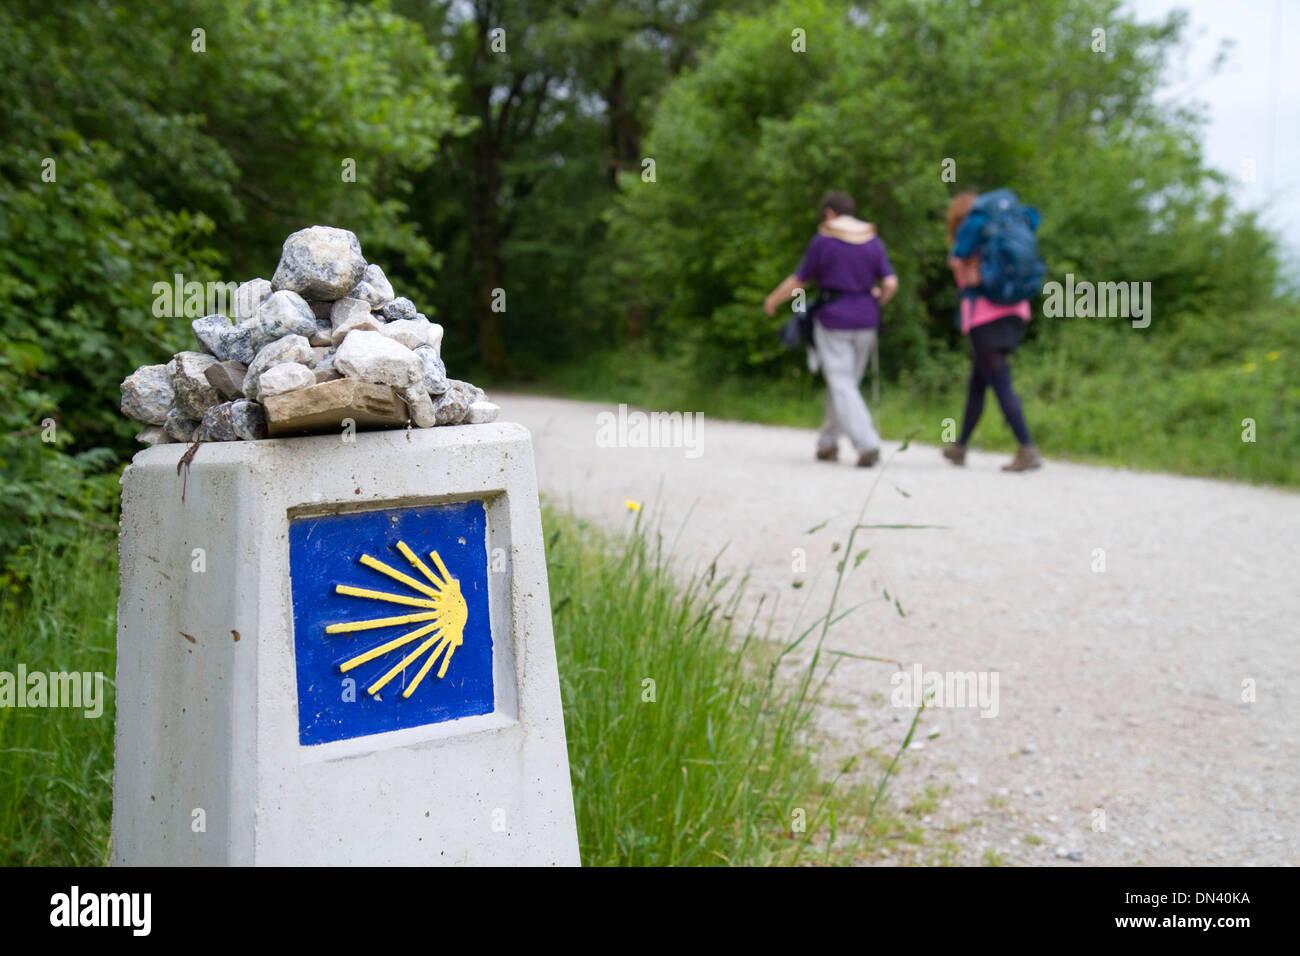 Pilgrims walk near a marker along the Camino De Santiago, the Way of St. James pilgrimage route, Navarra, Spain. - Stock Image